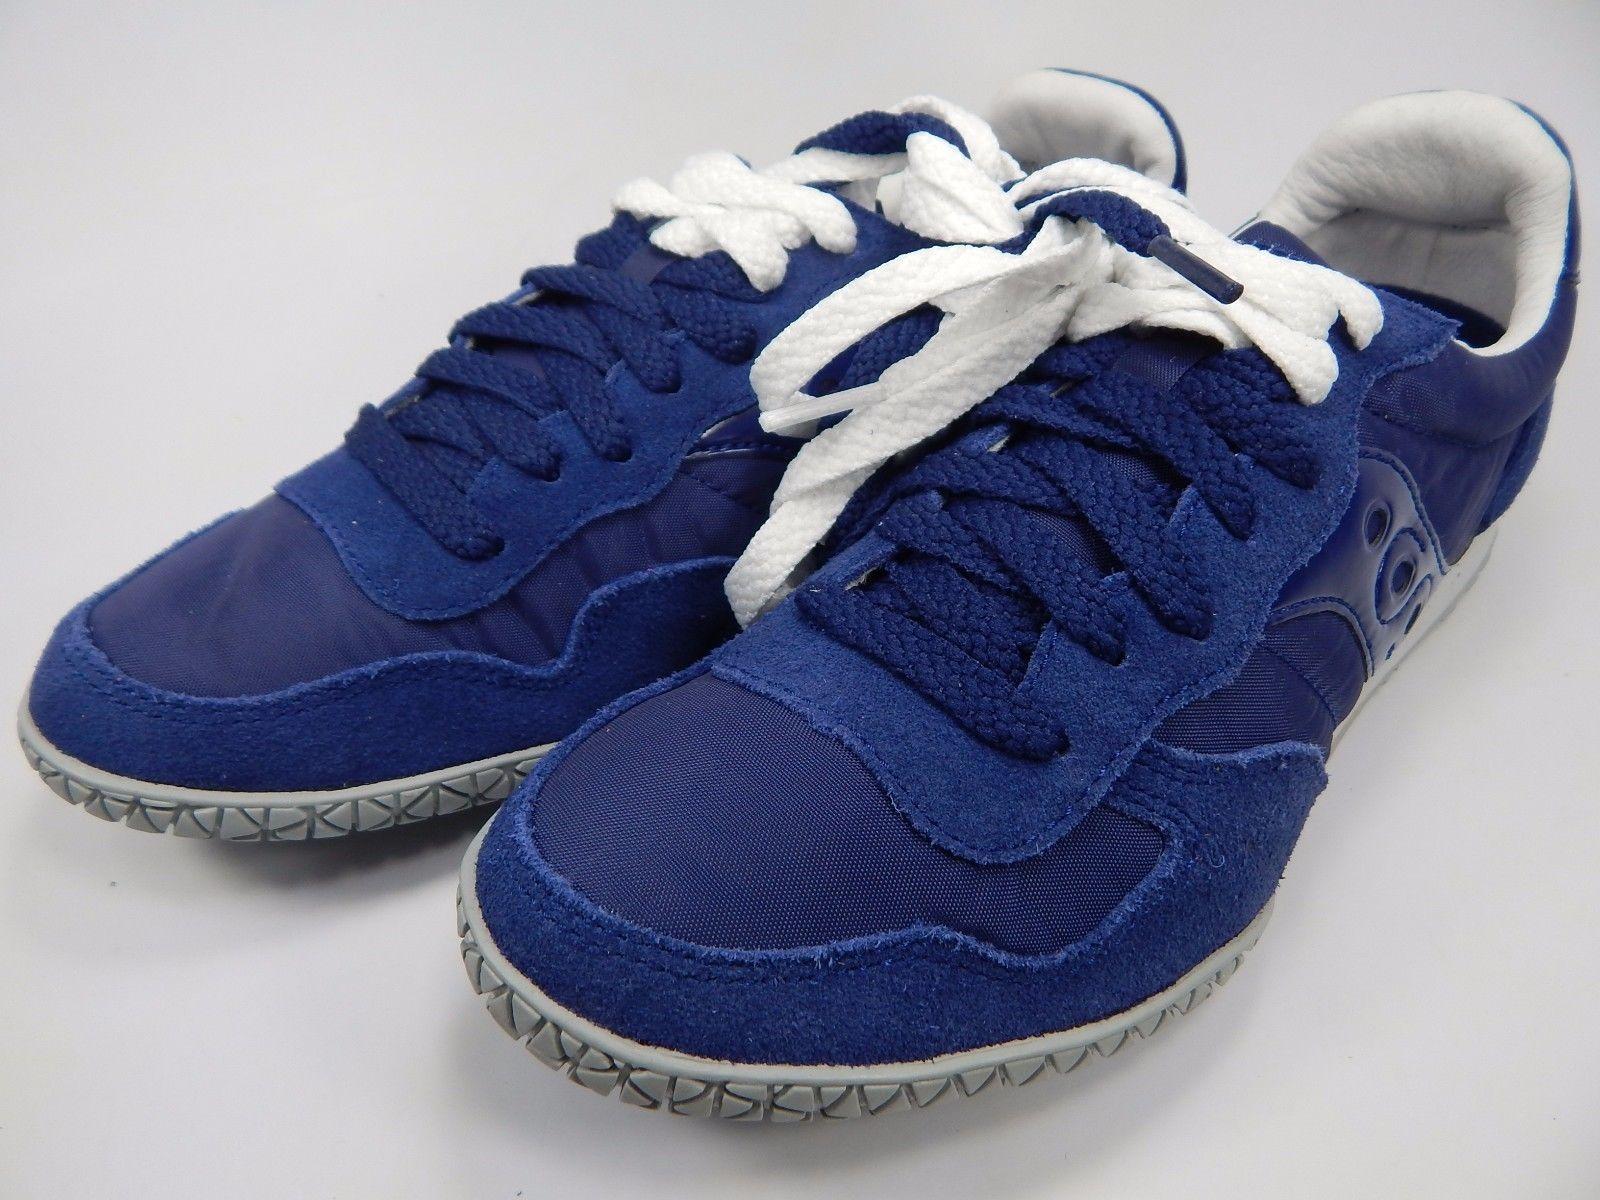 Saucony Original Bullet Women's Running Shoes Size 7 M (B) EU 38 Blue S1943-159